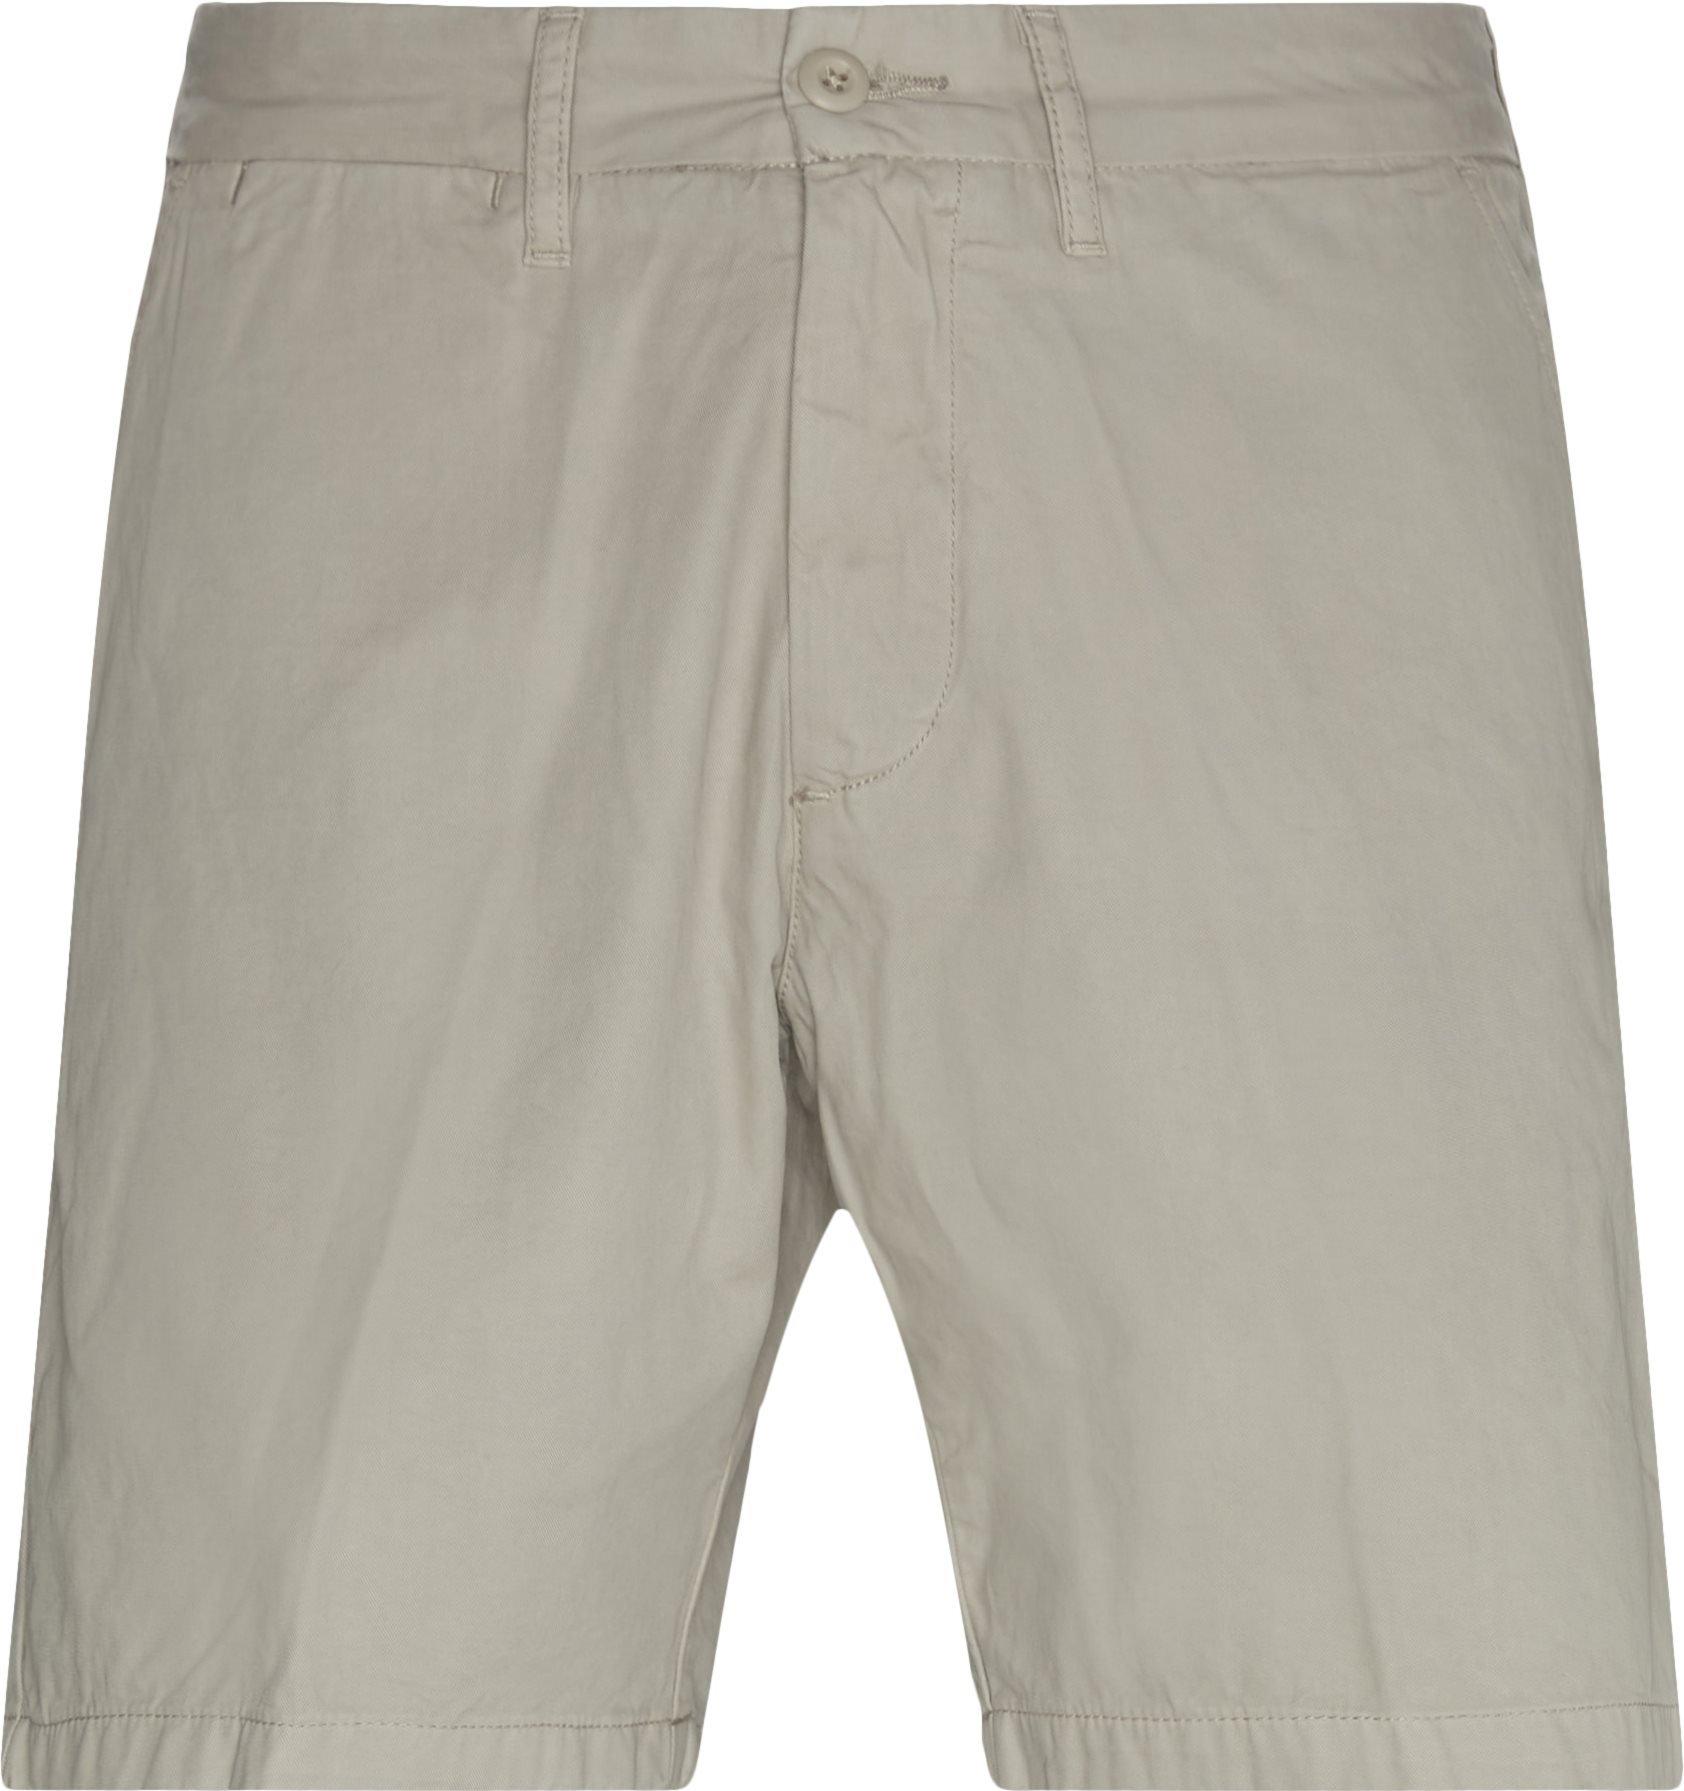 John Shorts I021730 - Shorts - Regular fit - Sand